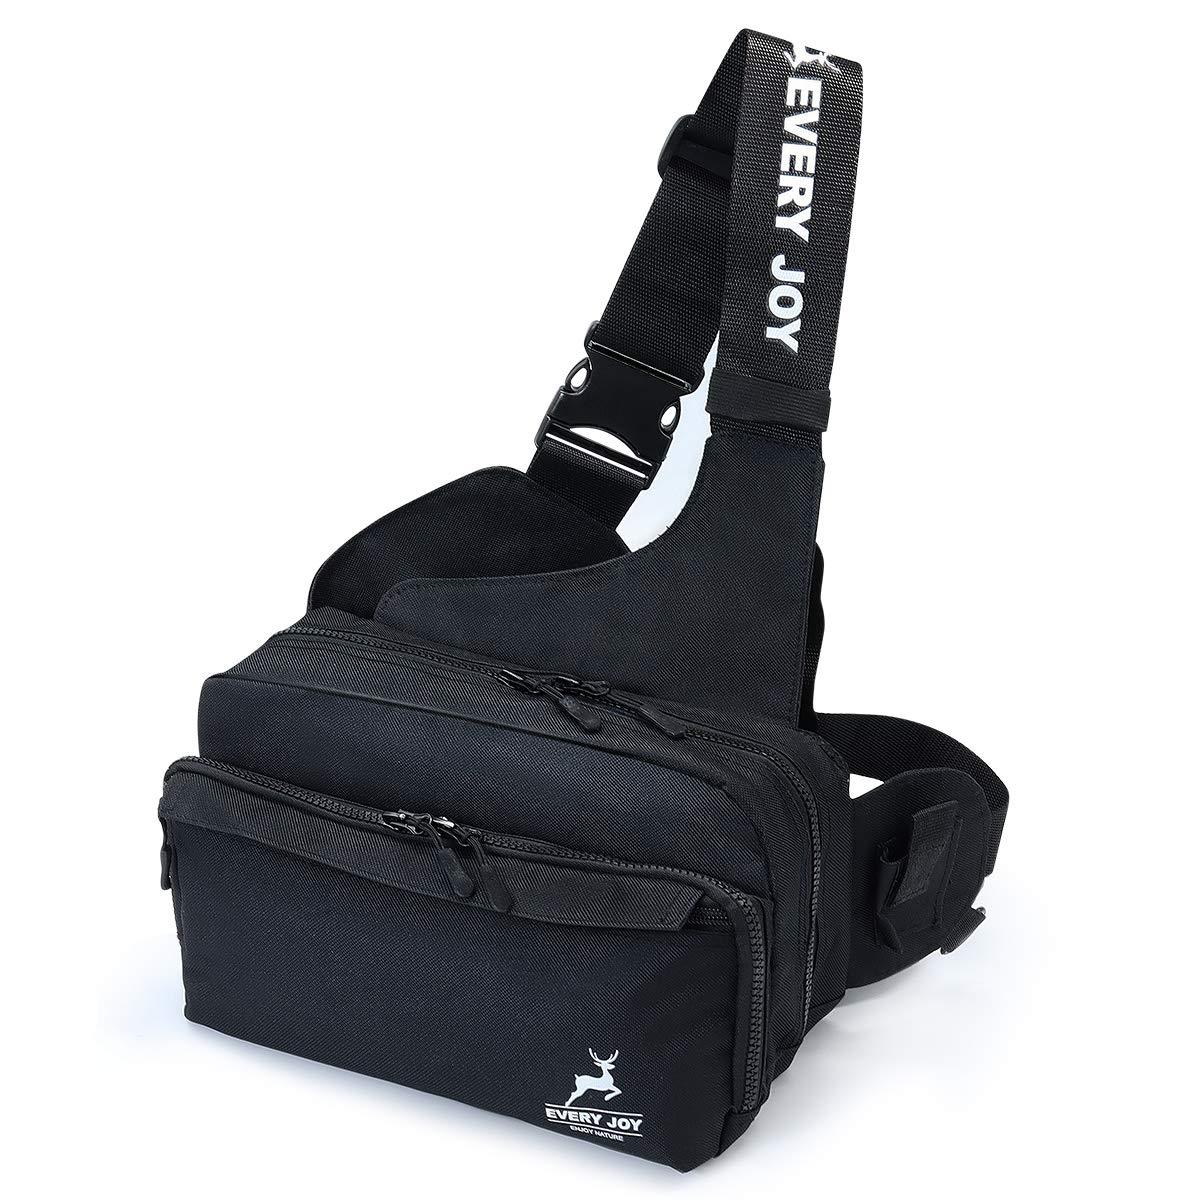 EveryJoy Fishing Tackle Storage Bag Large Capacity Multifunctional Backpack Lure Fishing Shoulder Bag